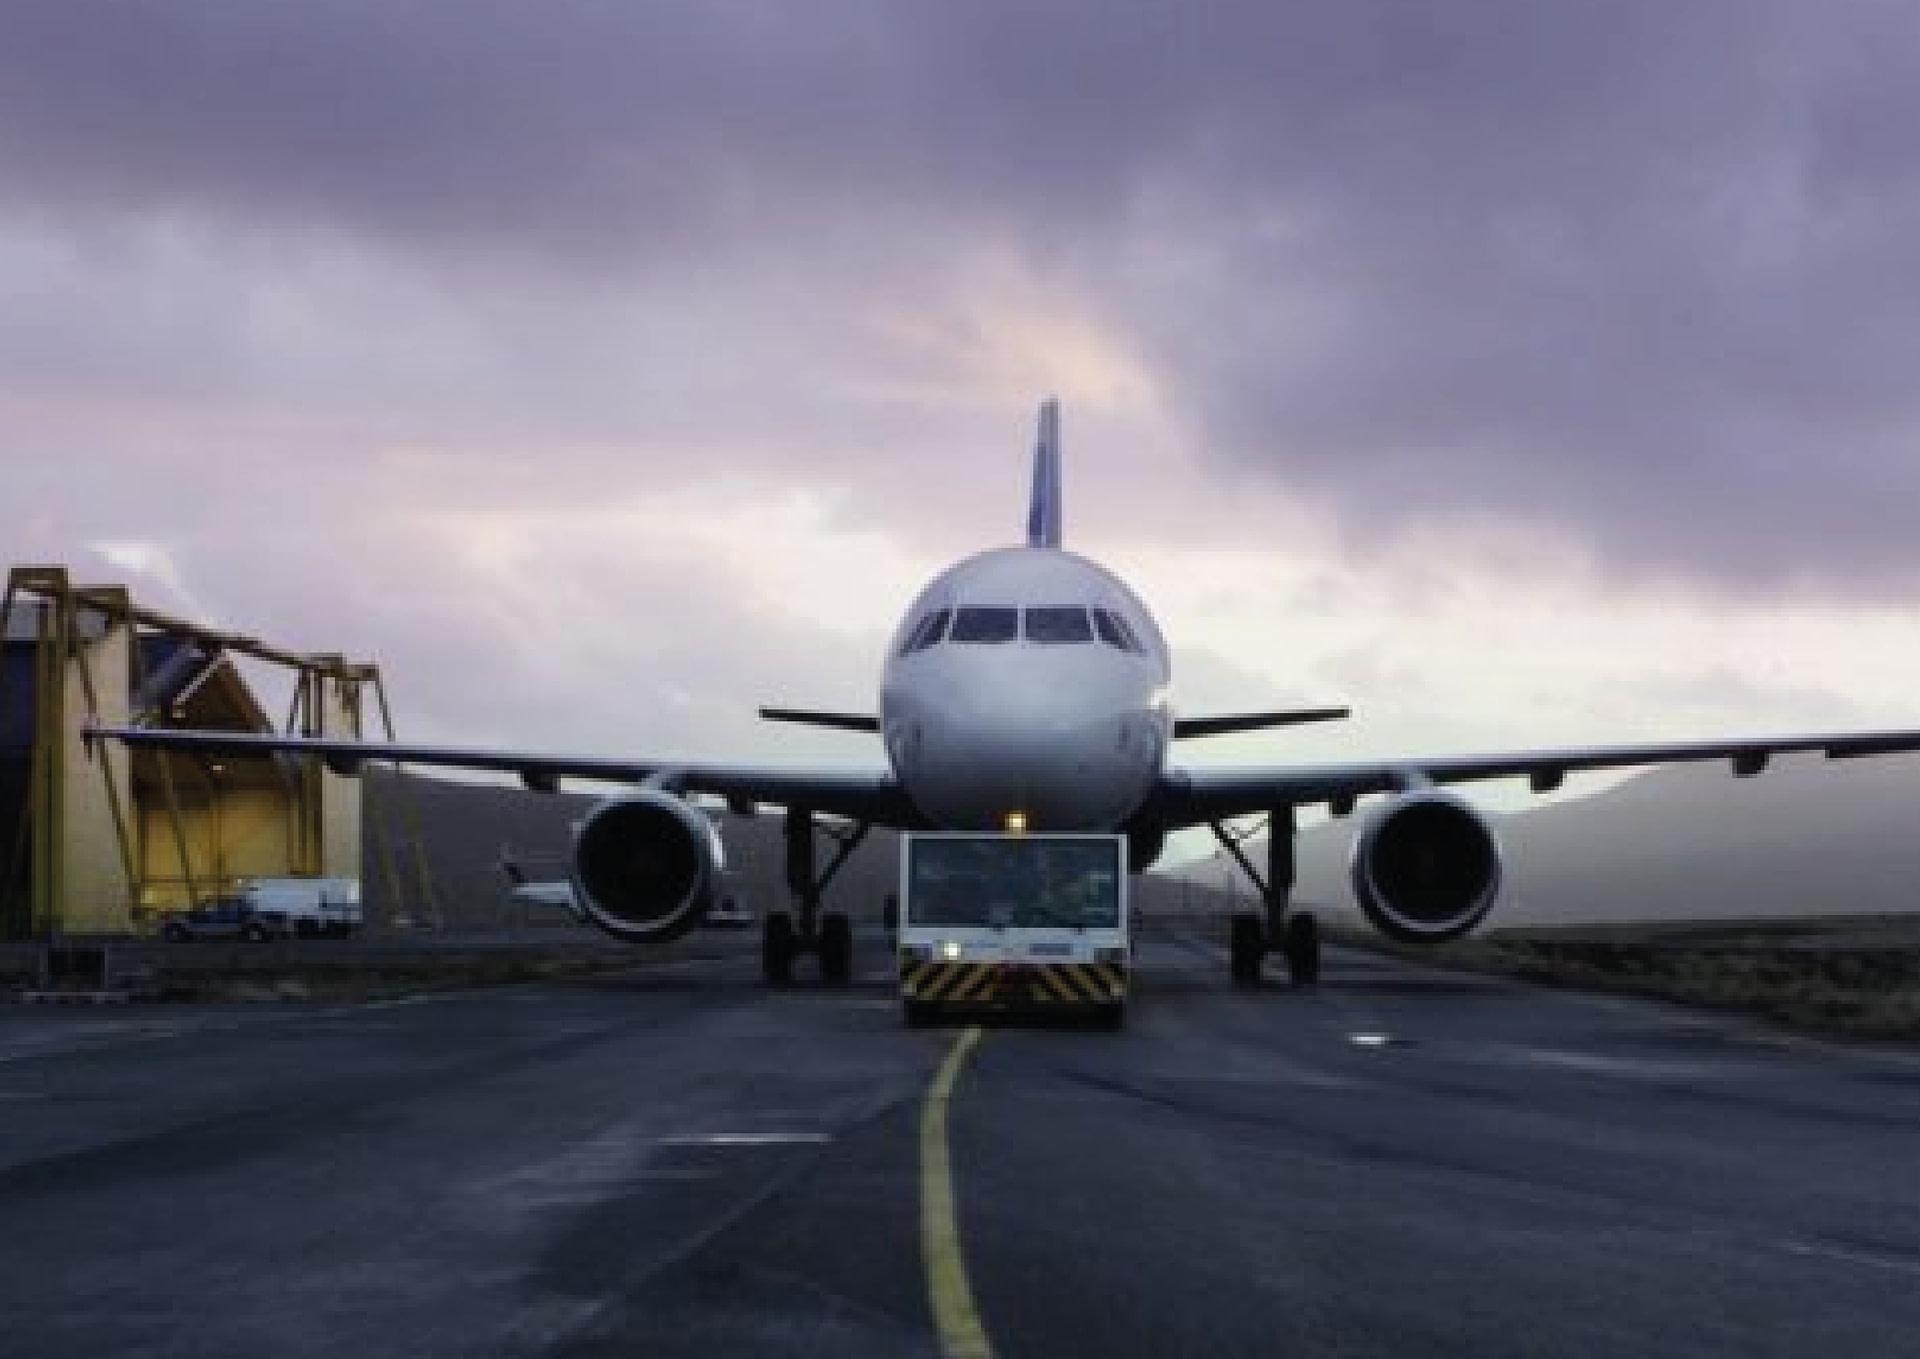 Atlantic Airways Safety video